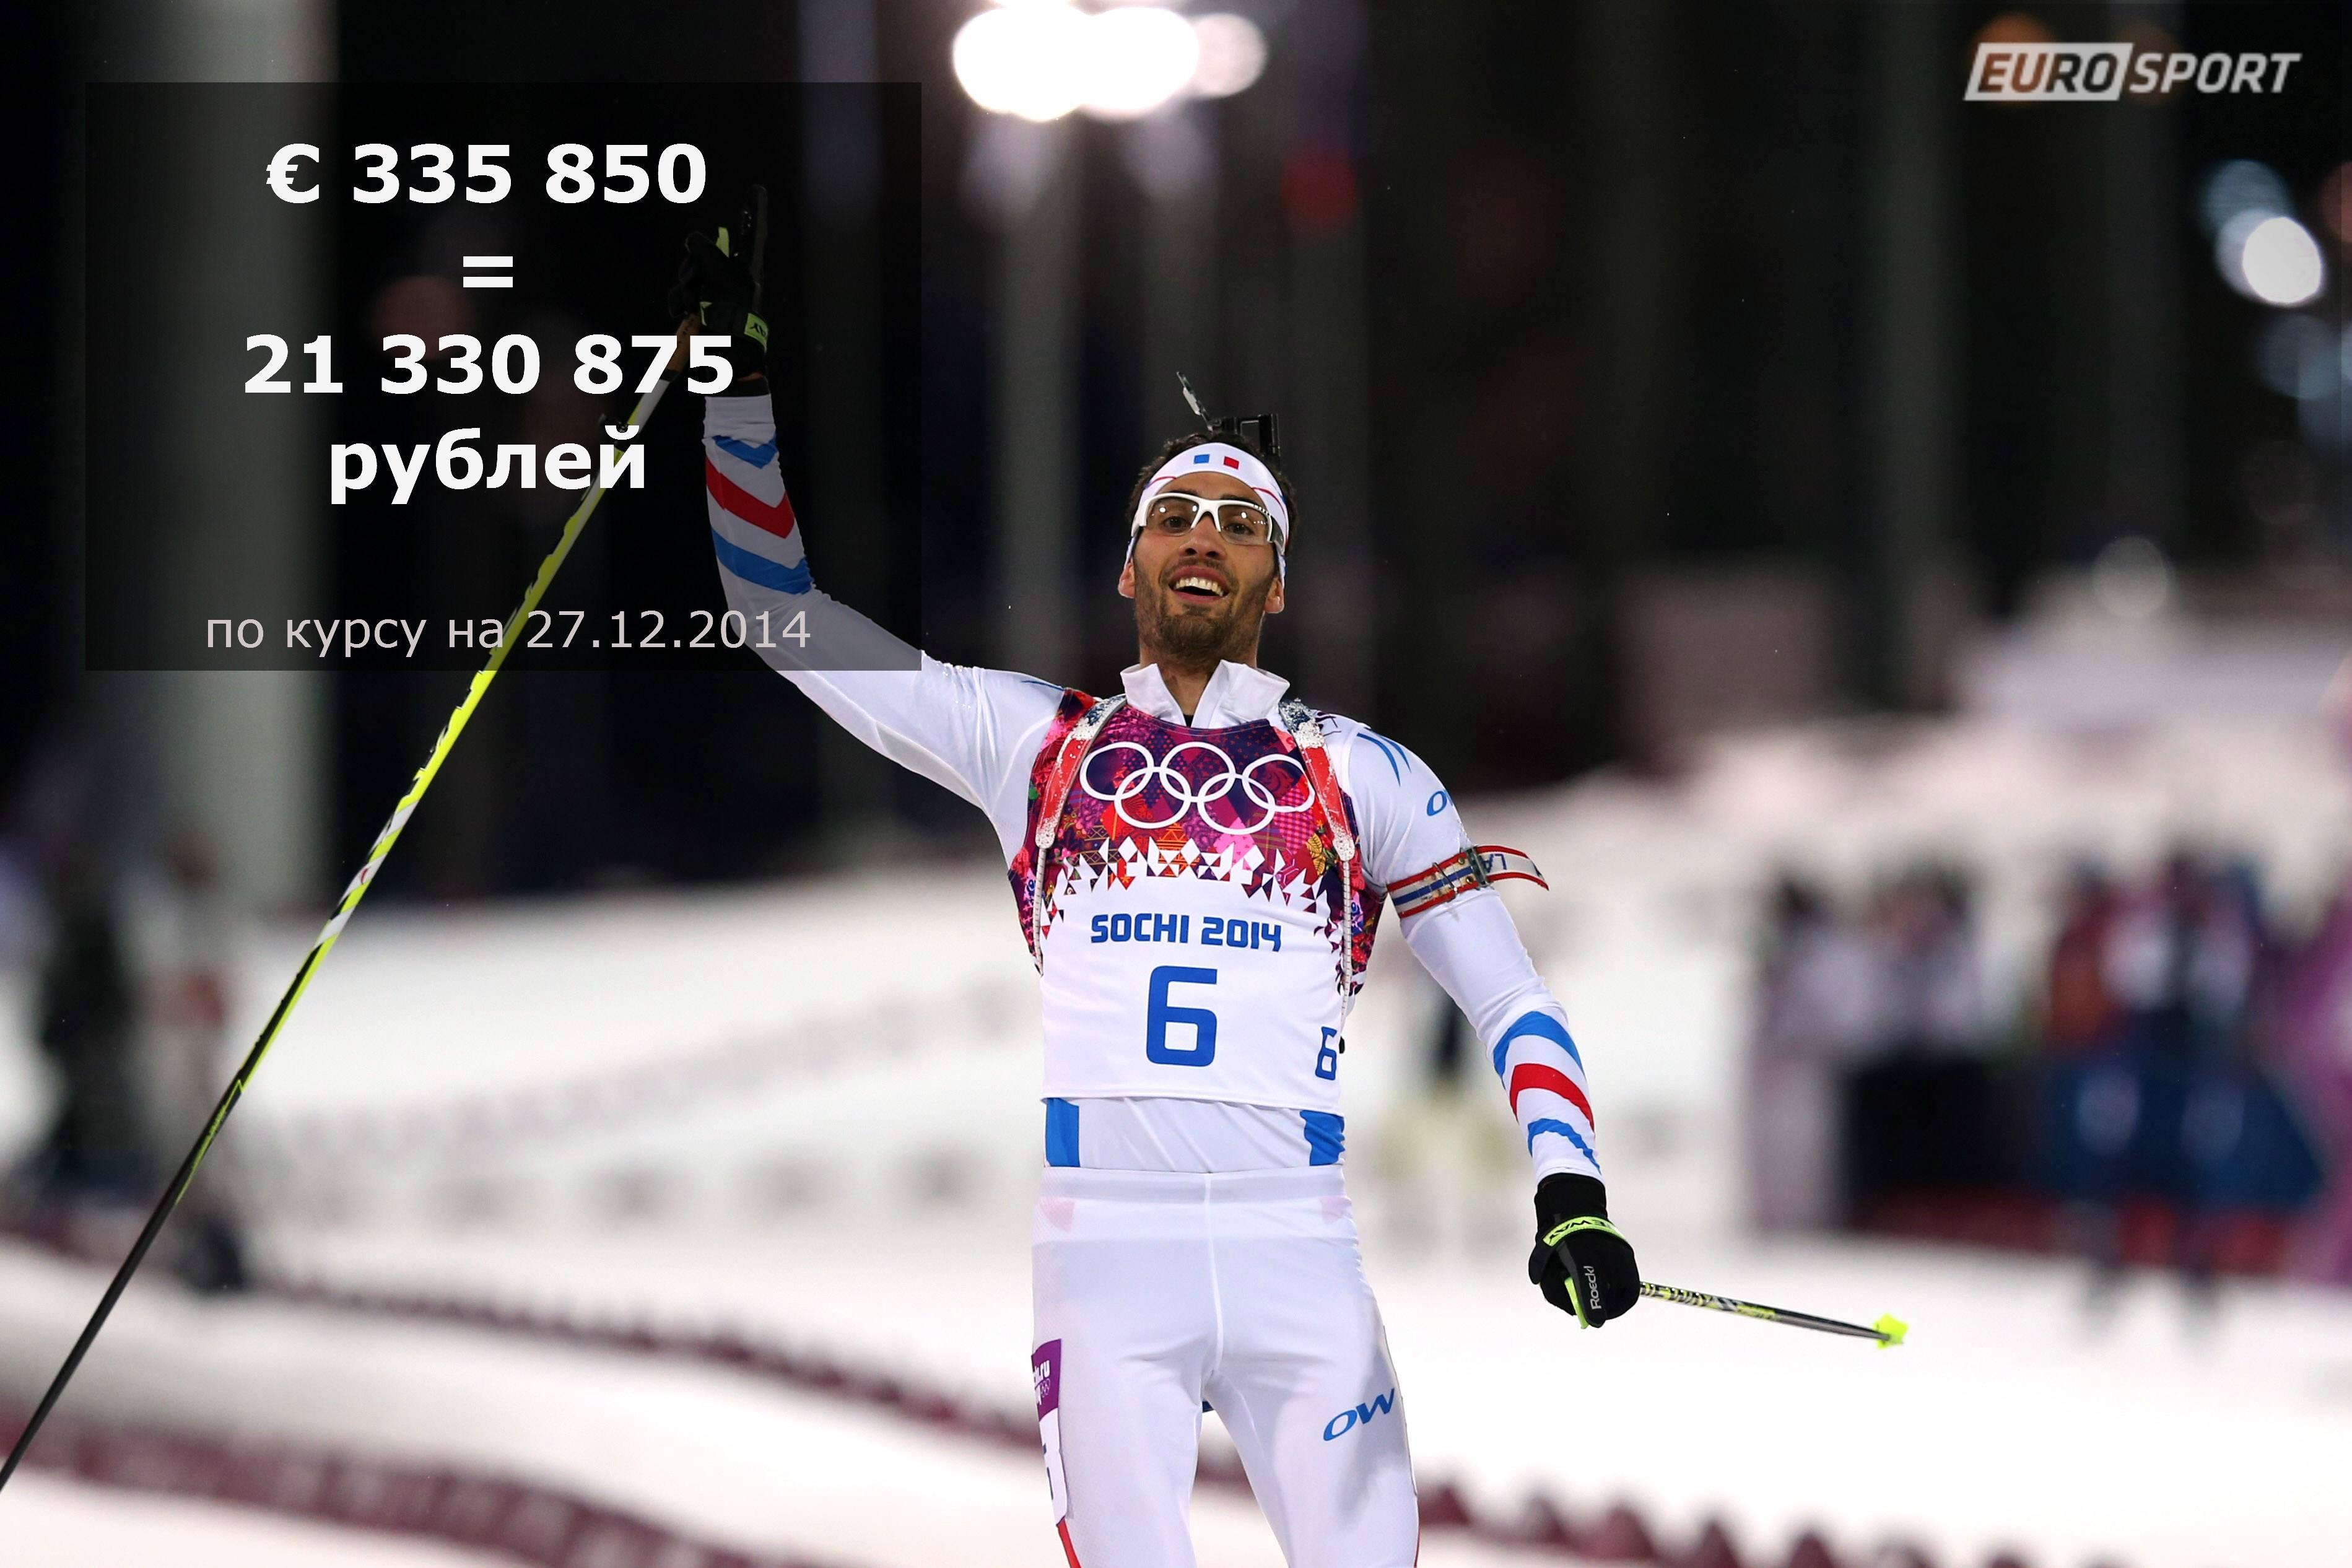 https://i.eurosport.com/2014/12/27/1378812.jpg